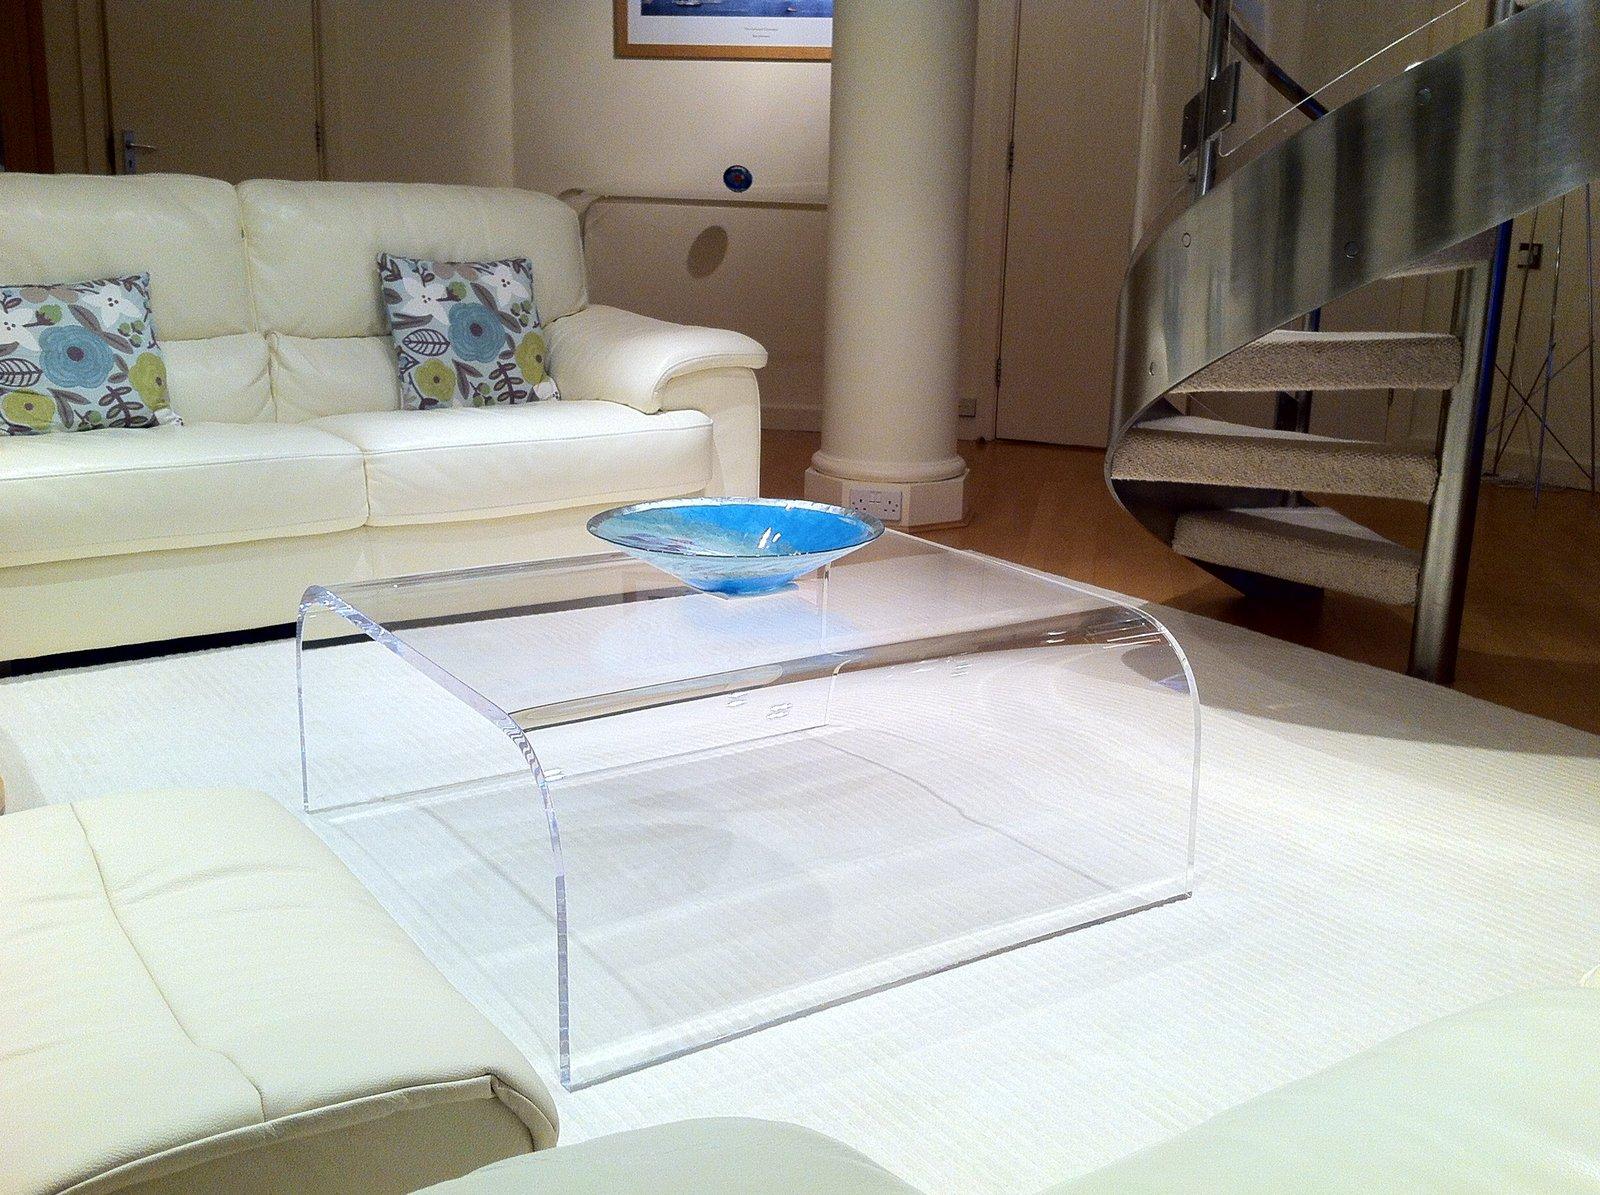 Ralph Marks Perspex \/ Acrylic Furniture UK — Acrylic Coffee Table UK